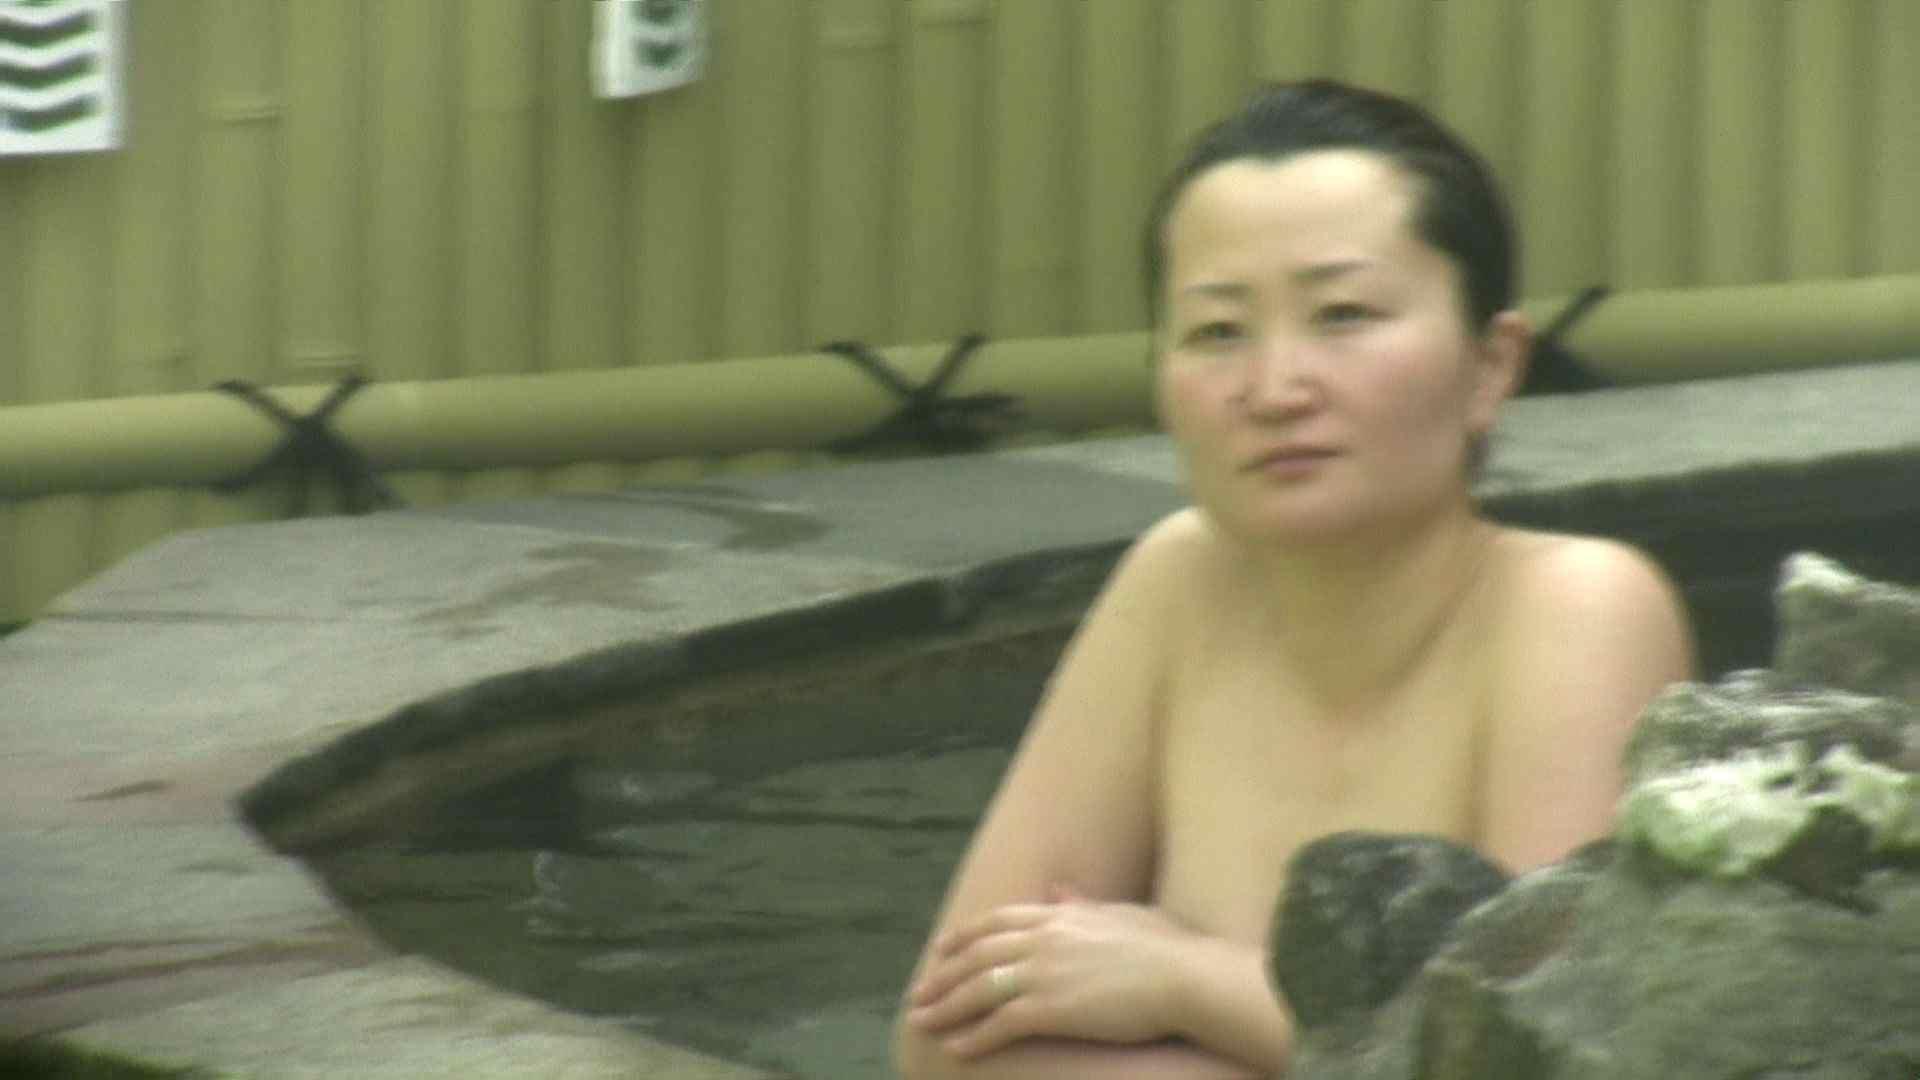 Aquaな露天風呂Vol.632 露天 戯れ無修正画像 70画像 47